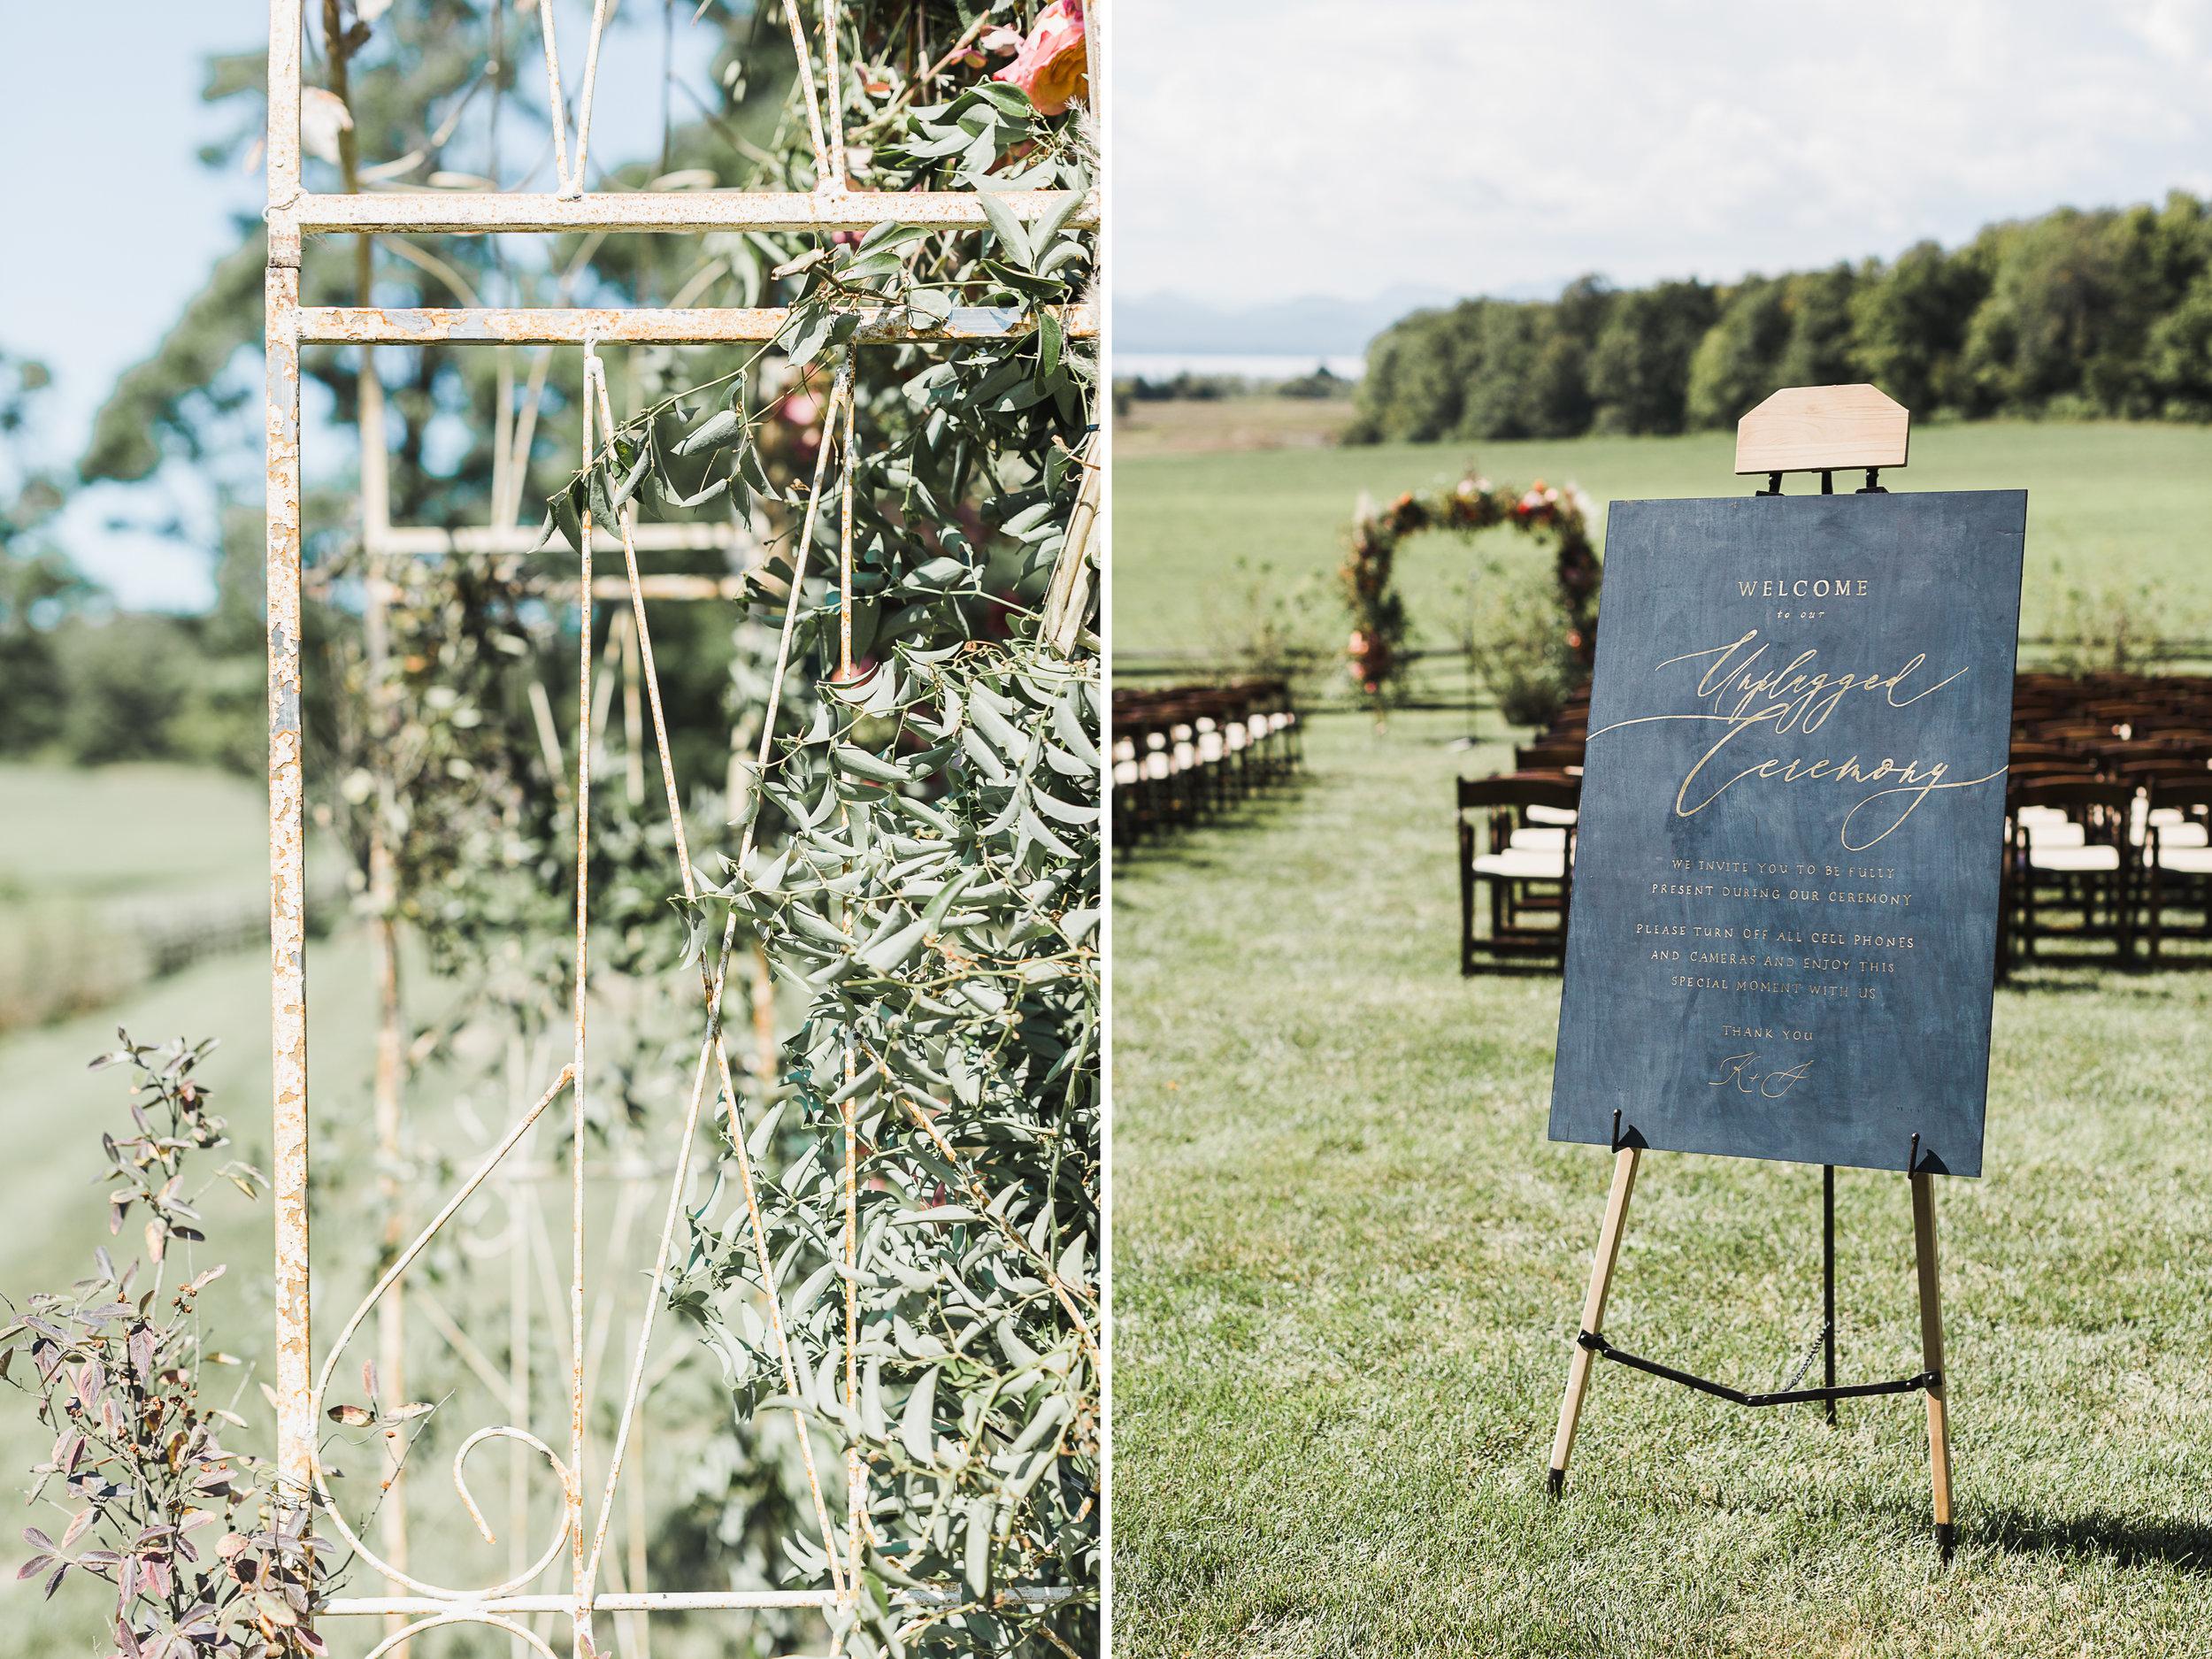 Vermont-Brick-House-Wedding.jpg